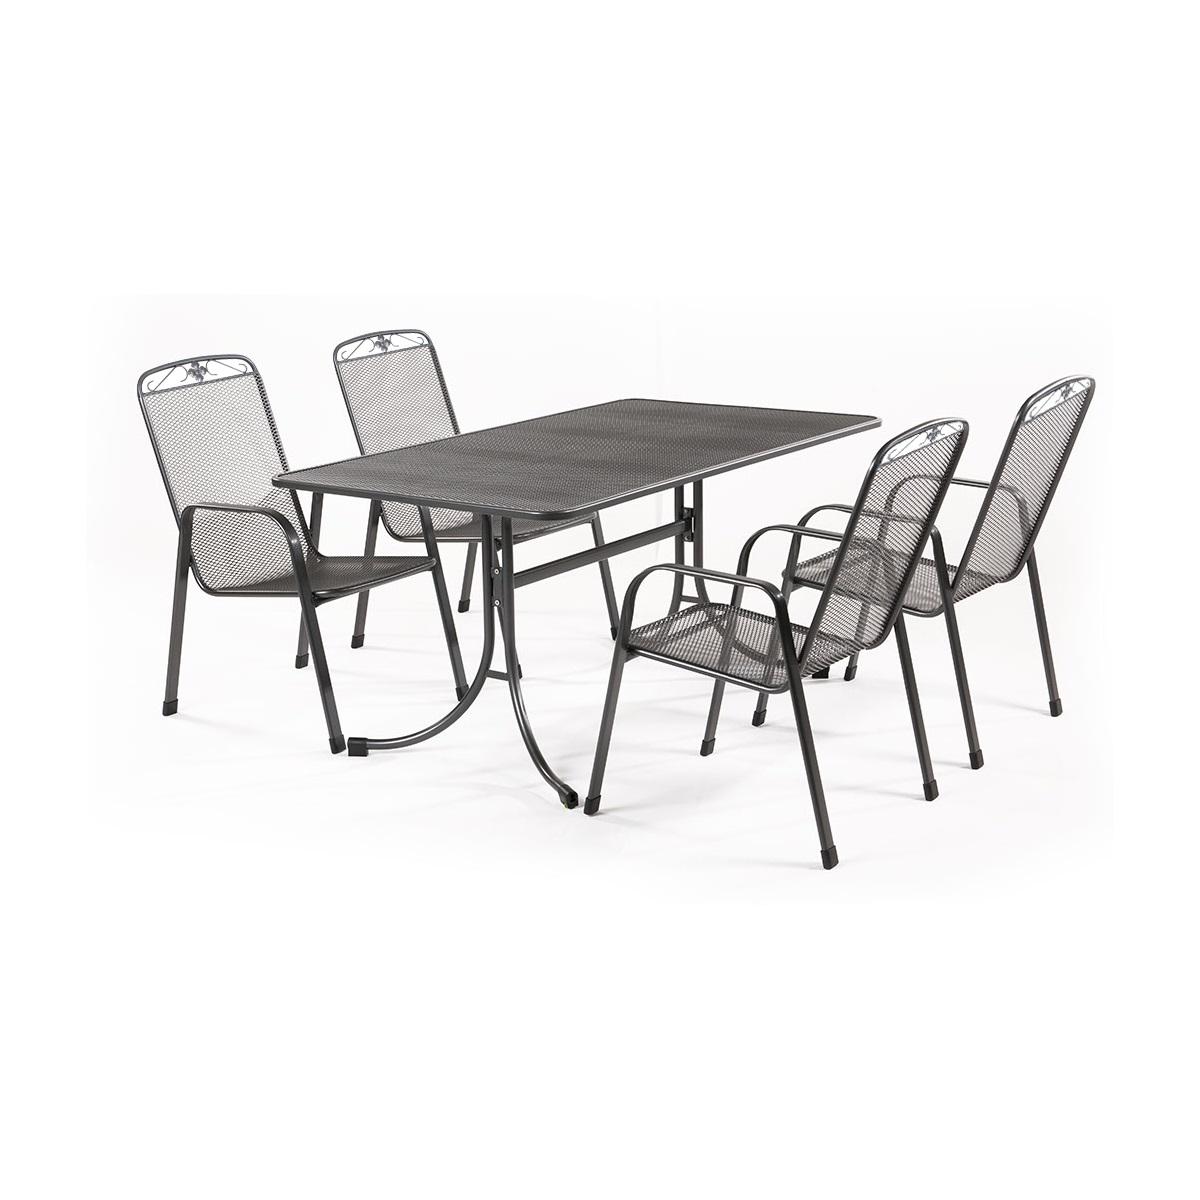 MWH Banis 4+, sestava nábytku z tahokovu (4x židle Savoy, 1x stůl Universal 145)